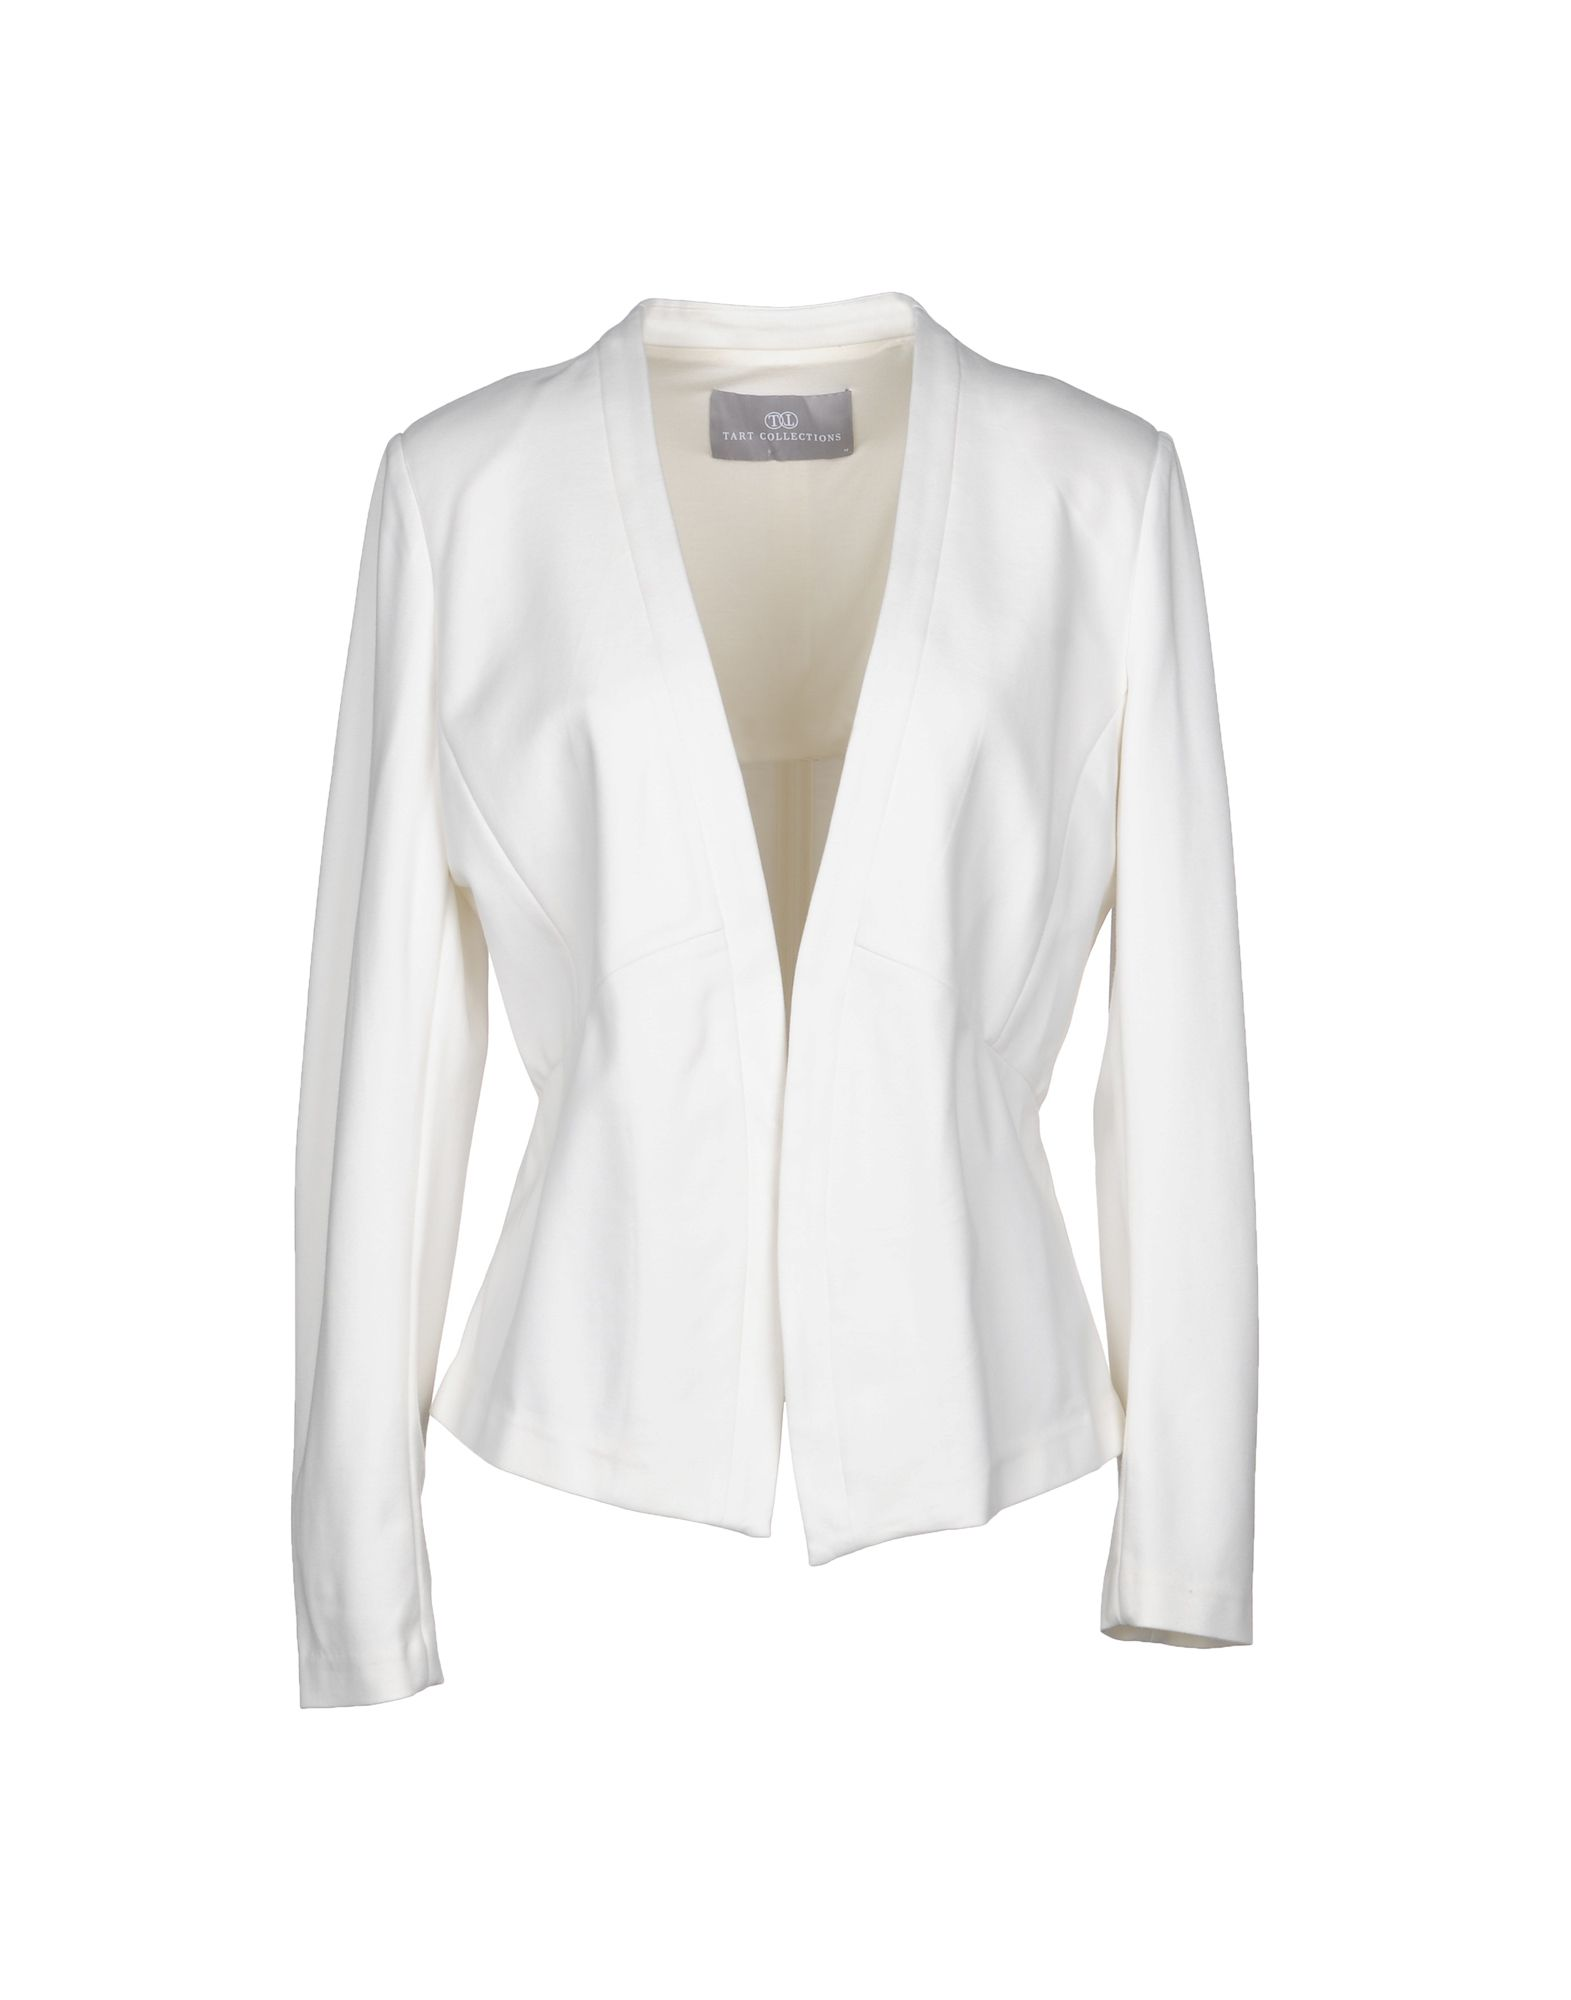 TART COLLECTIONS Blazer in White